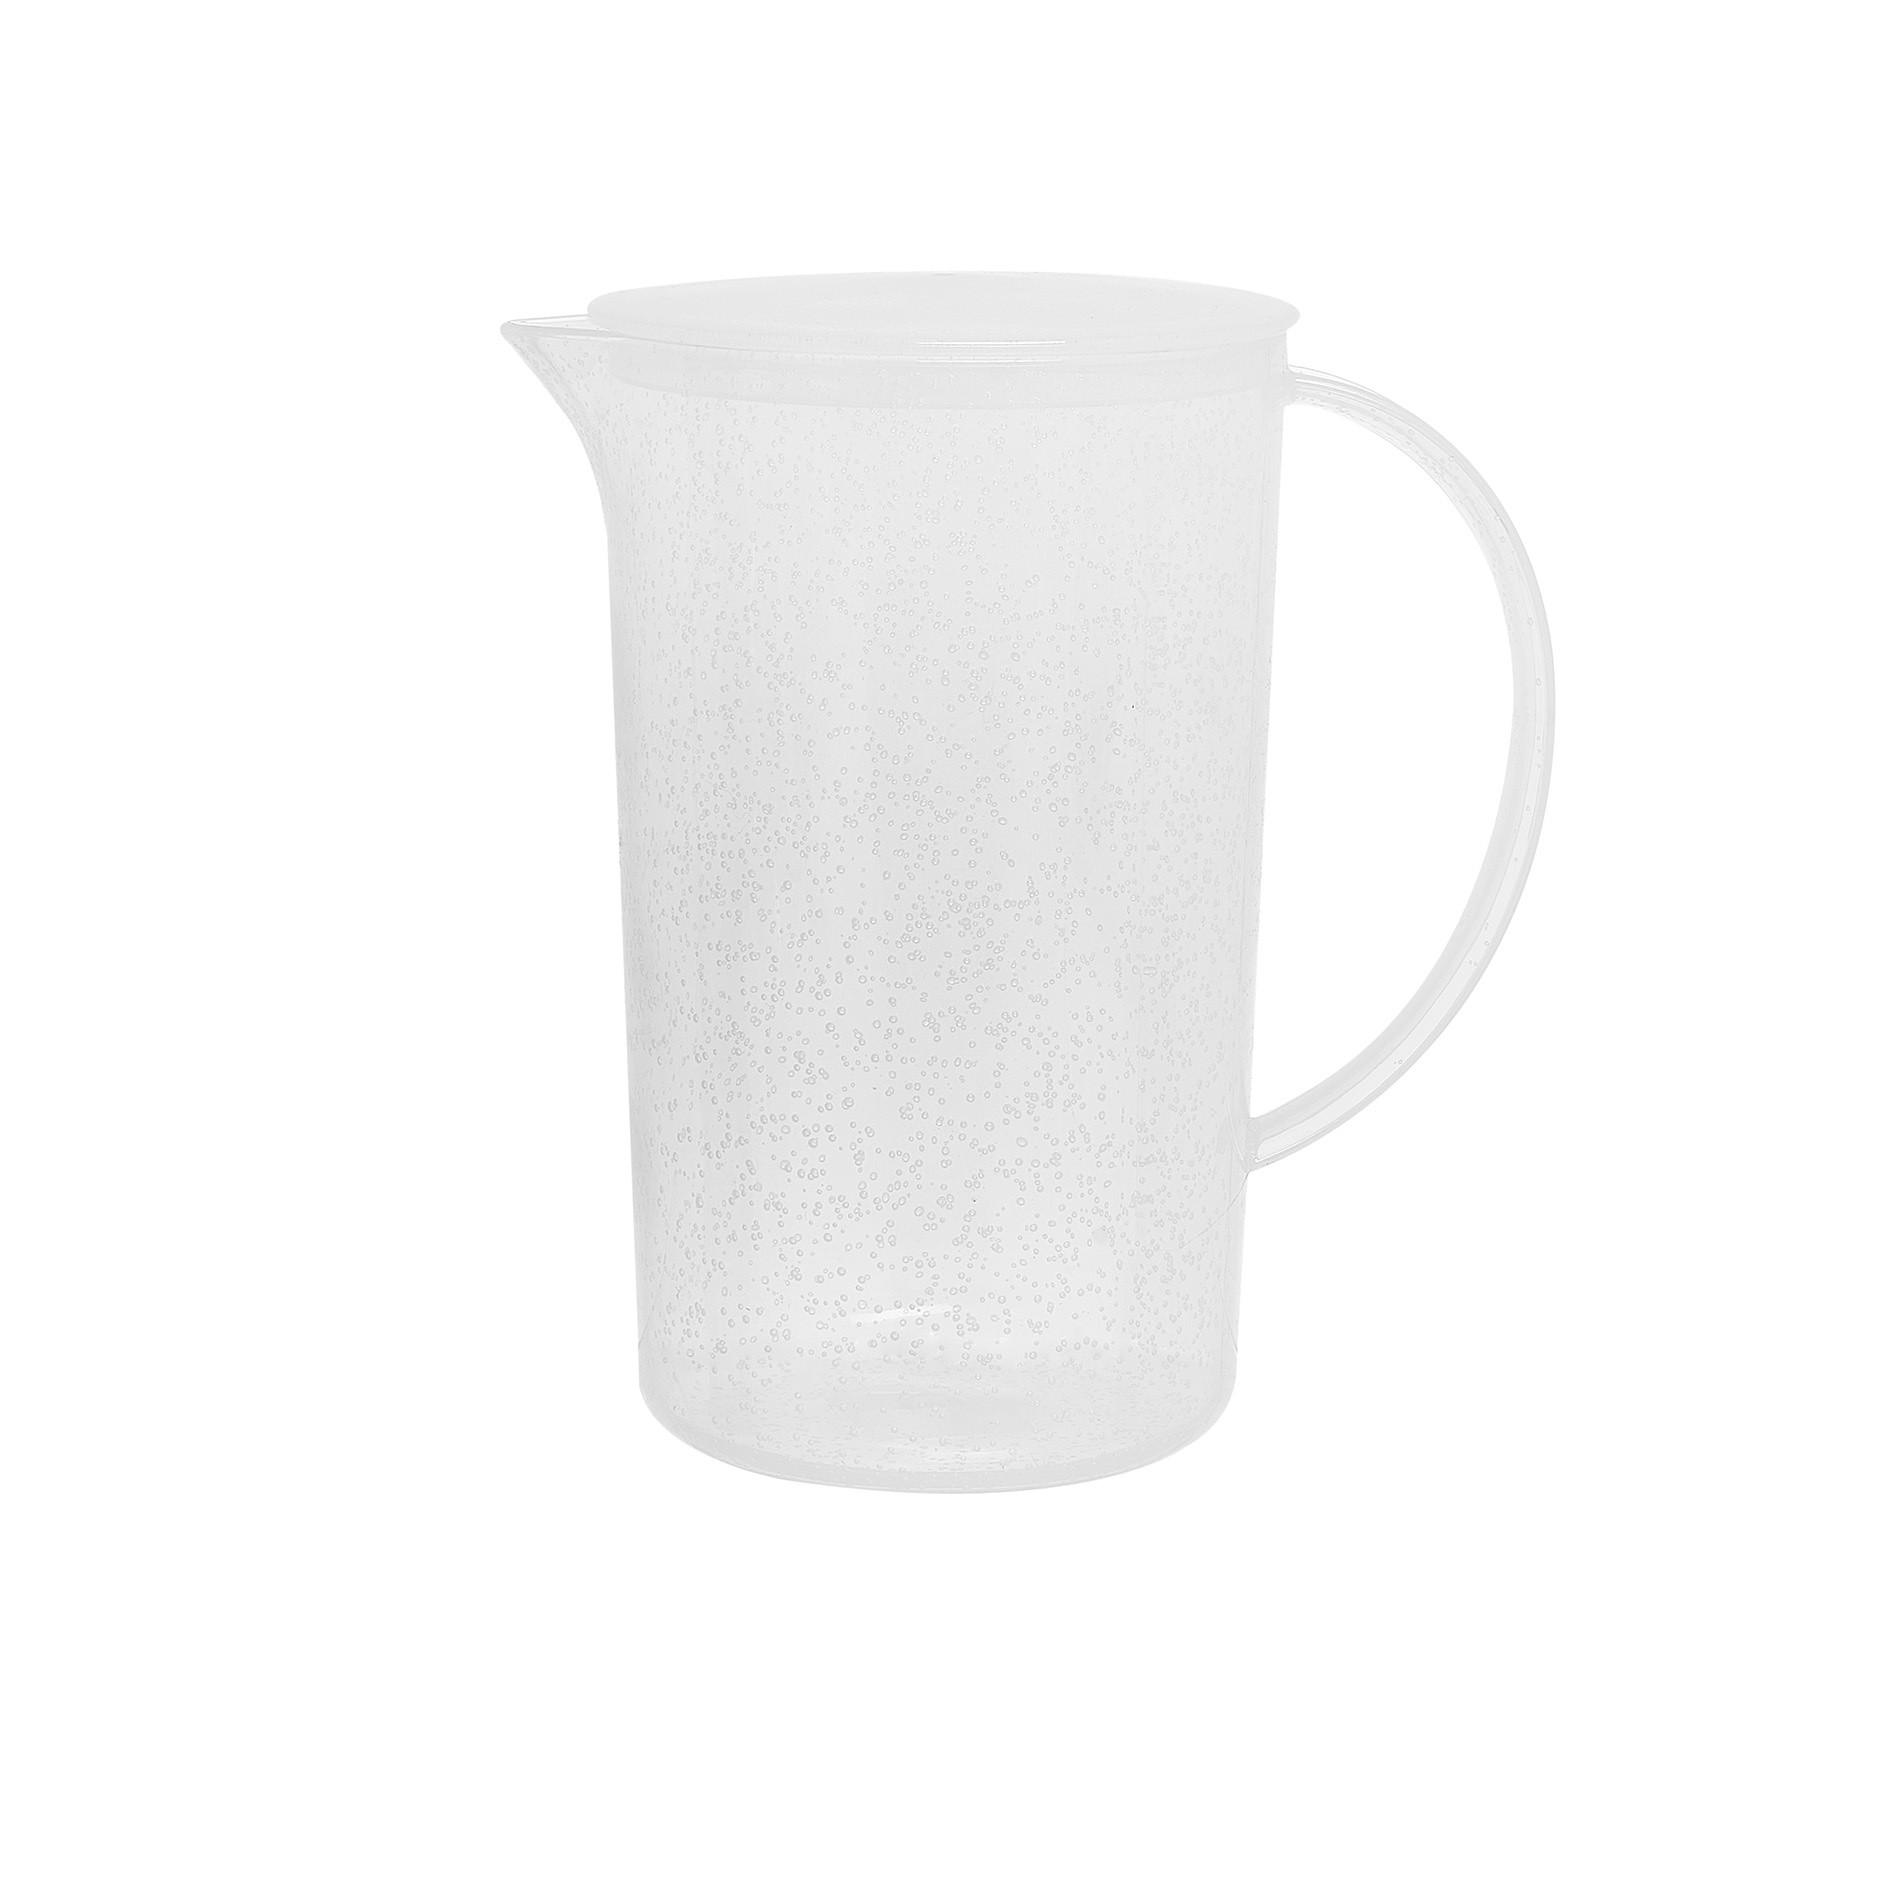 Caraffa plastica bolle, Bianco, large image number 0